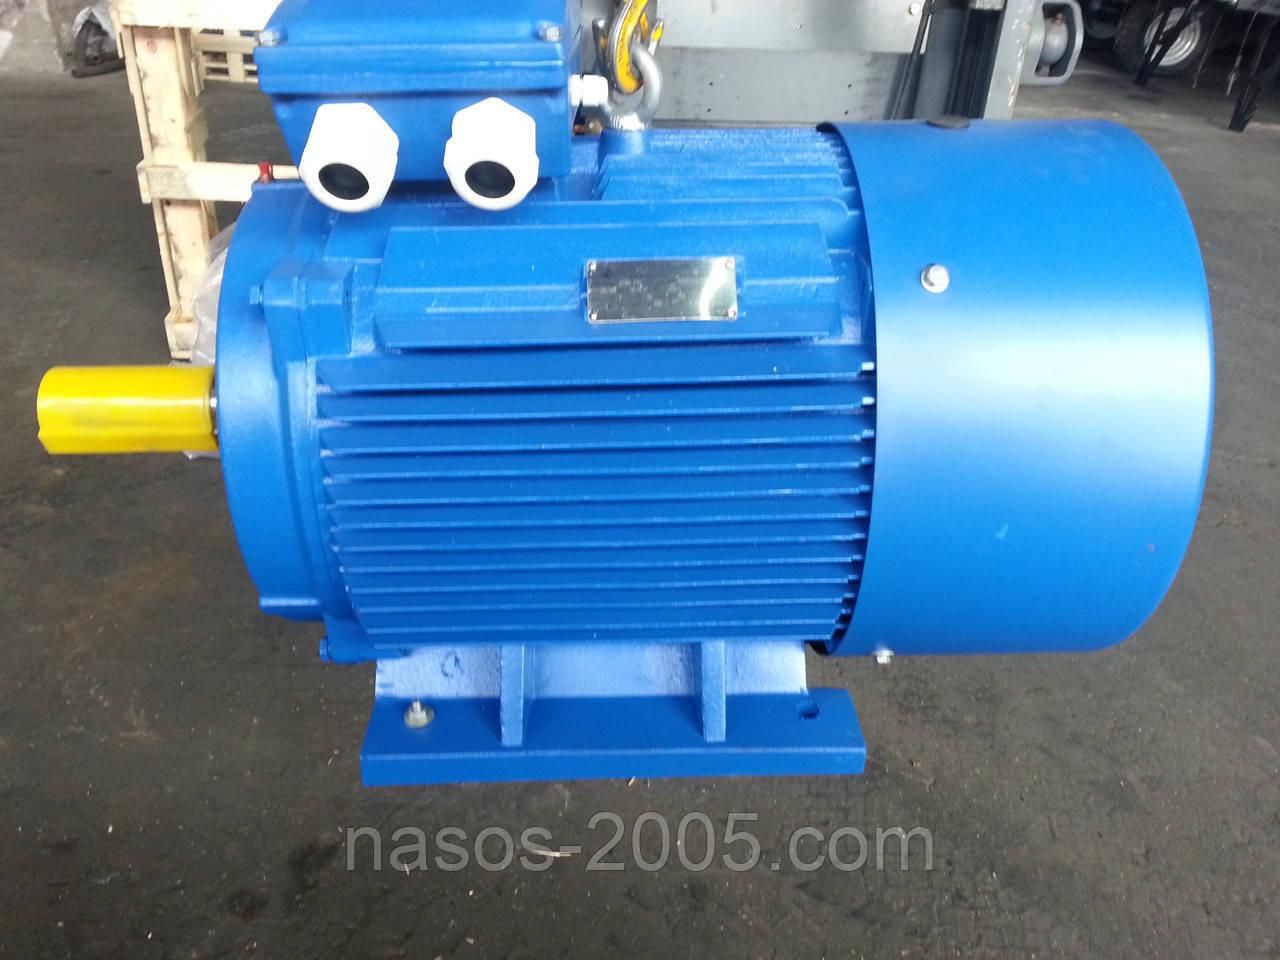 Электродвигатель АИР 71 B6 0,55кВт 1000 об/мин